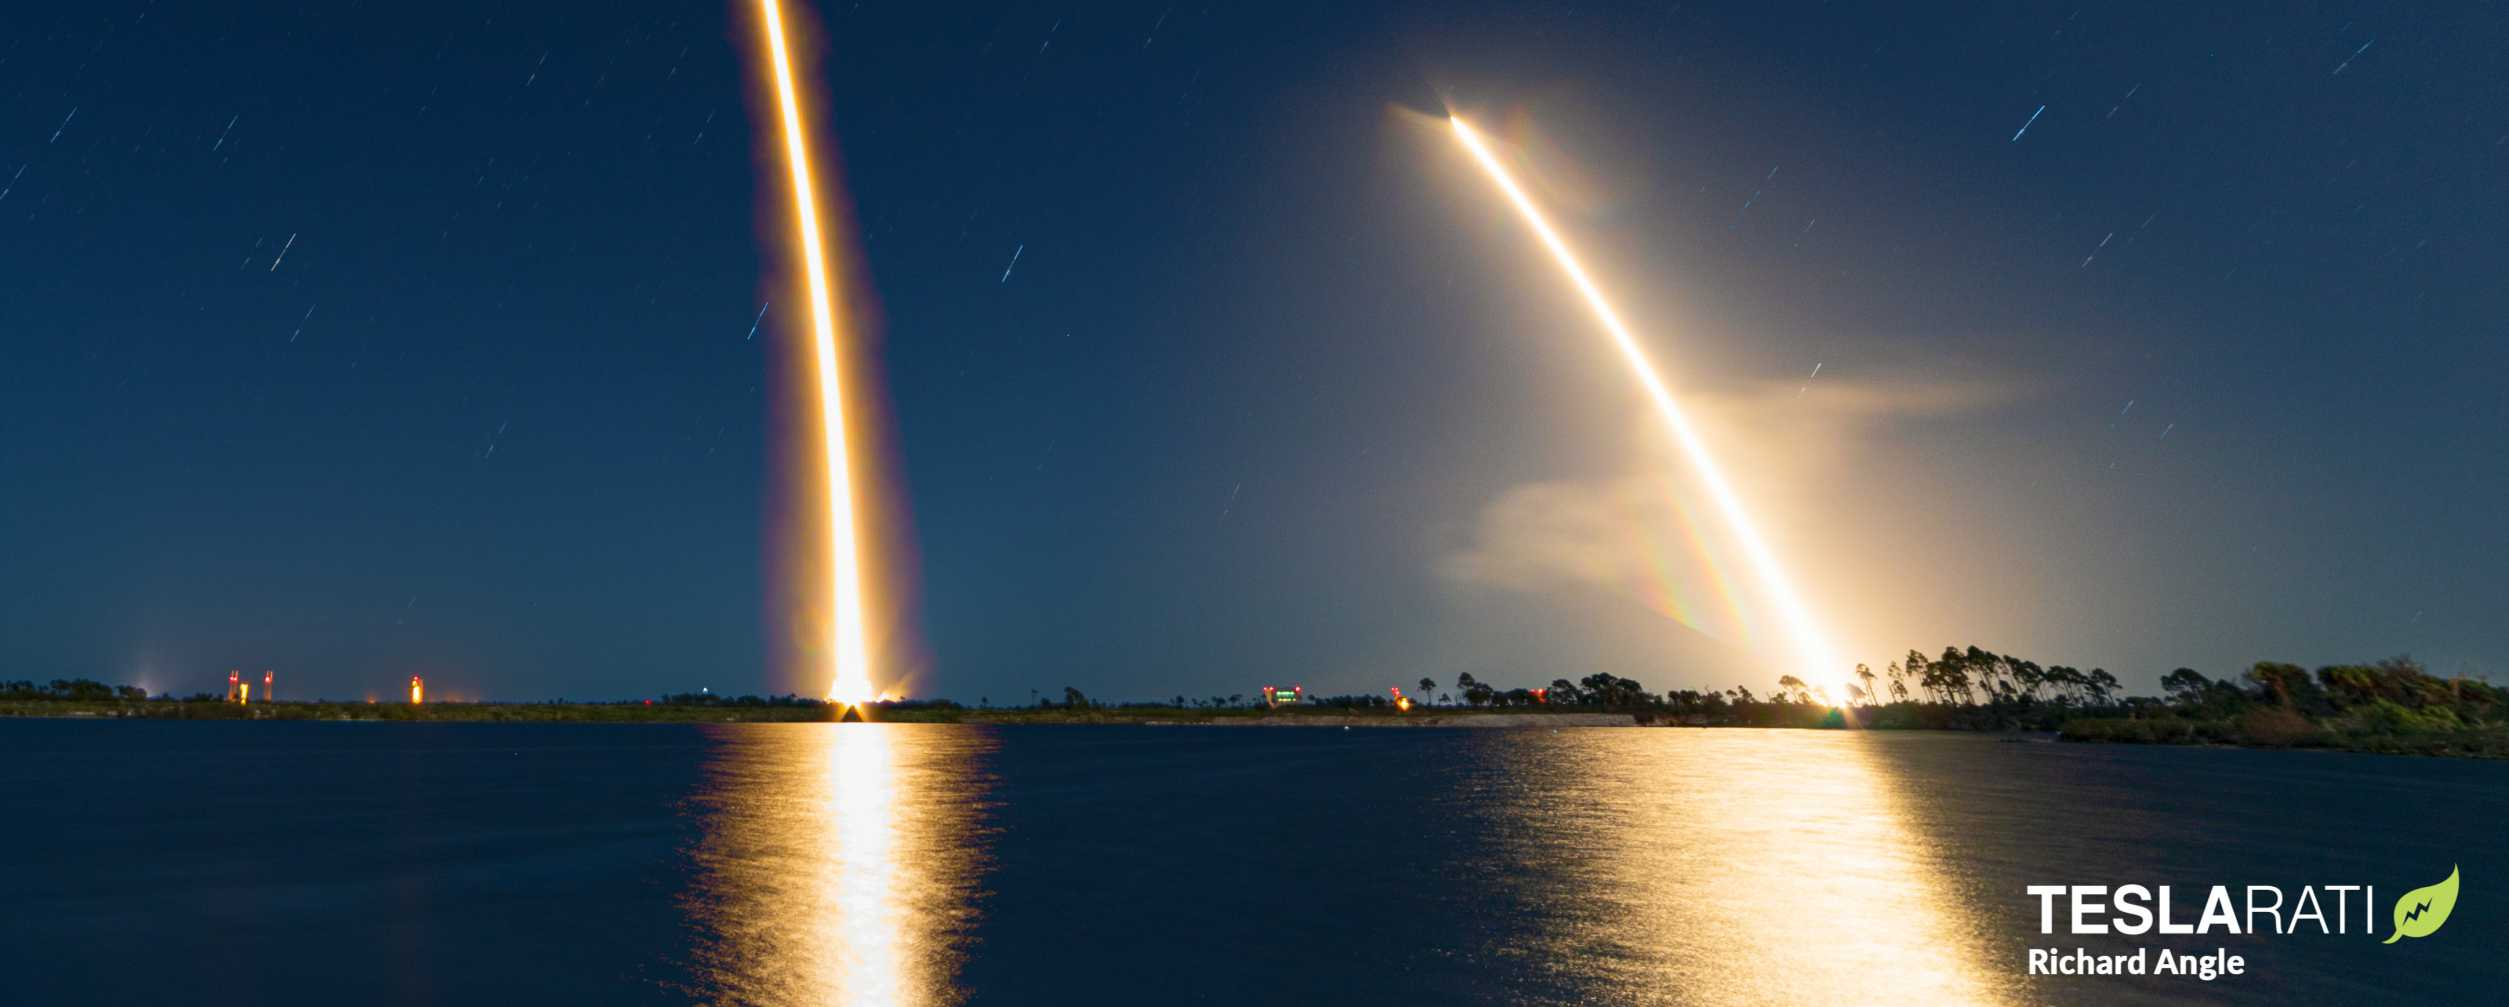 CRS-20 Dragon C112 Falcon 9 B1059 (Richard Angle) pre launch landing (10) crop 1 (c)